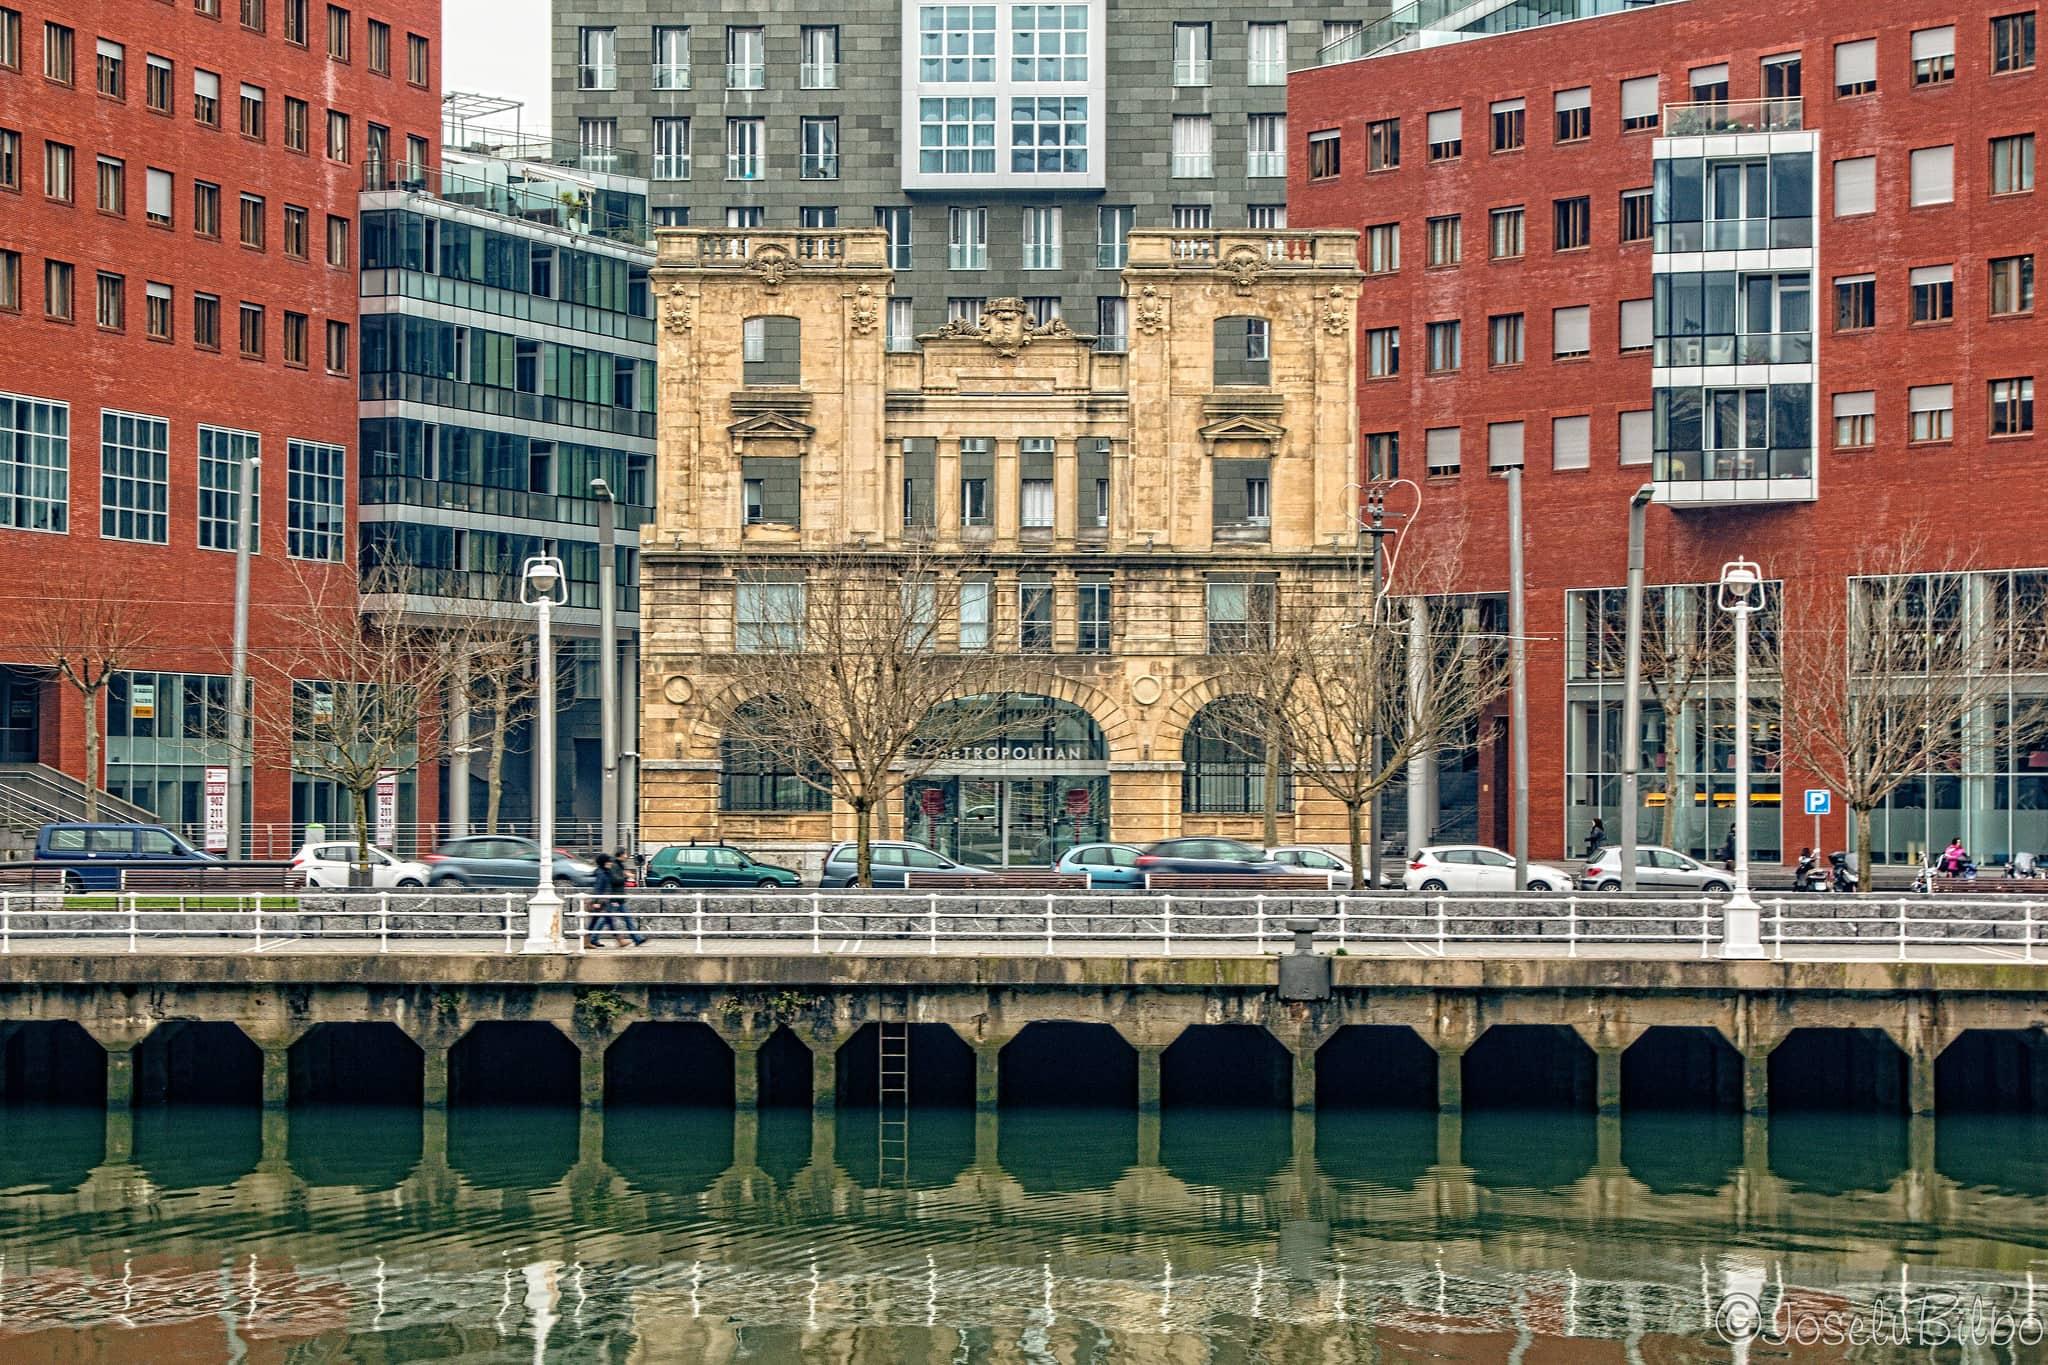 17251778232 8515d37175 k - Stedentrip Bilbao: de mooiste bezienswaardigheden & leukste restaurants